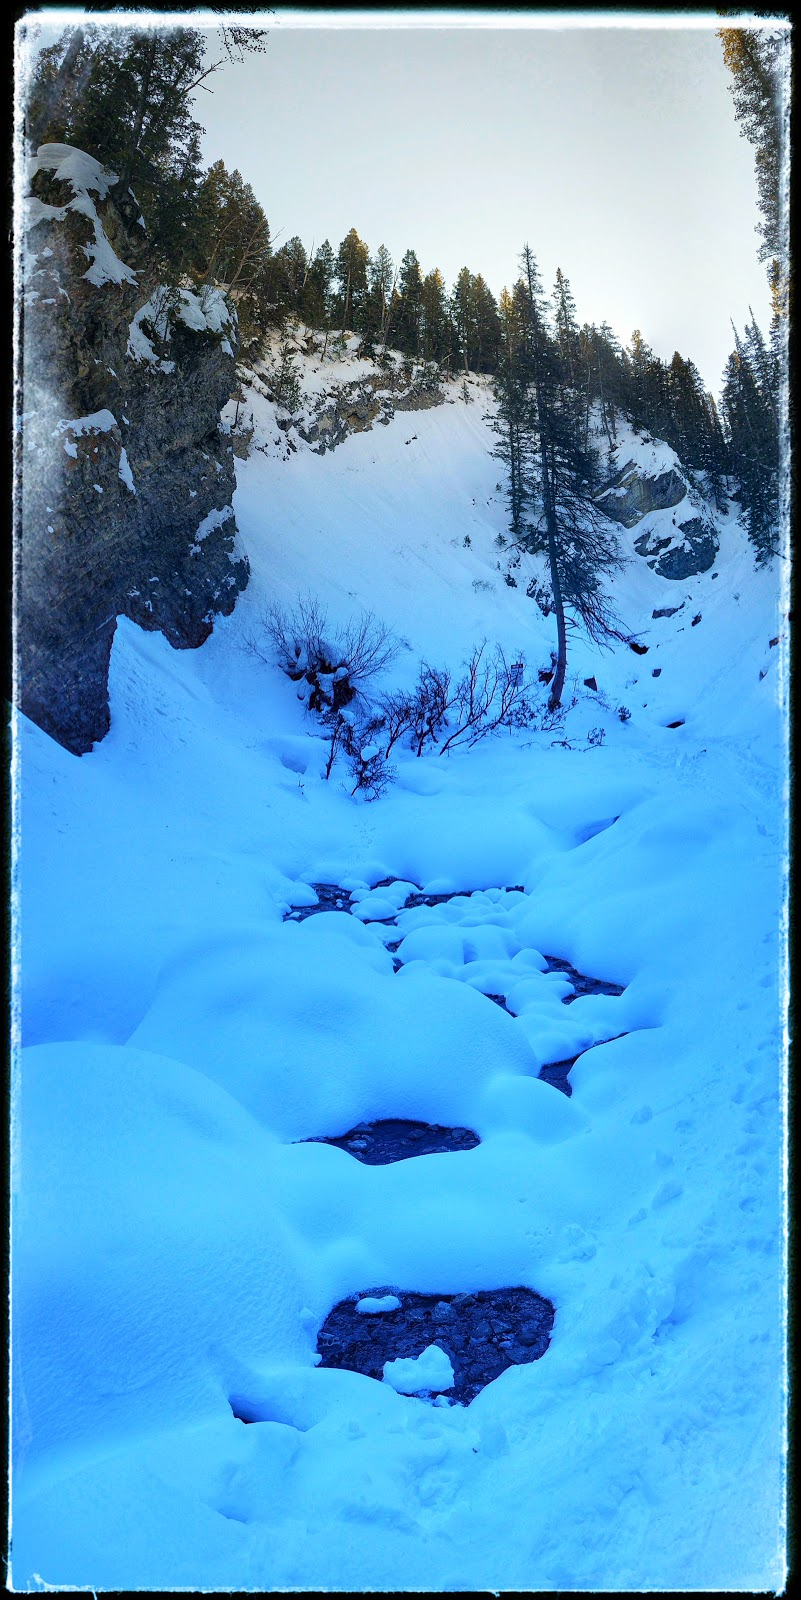 Donut Falls Big Cottonwood Canyon Utah in 360 Degrees